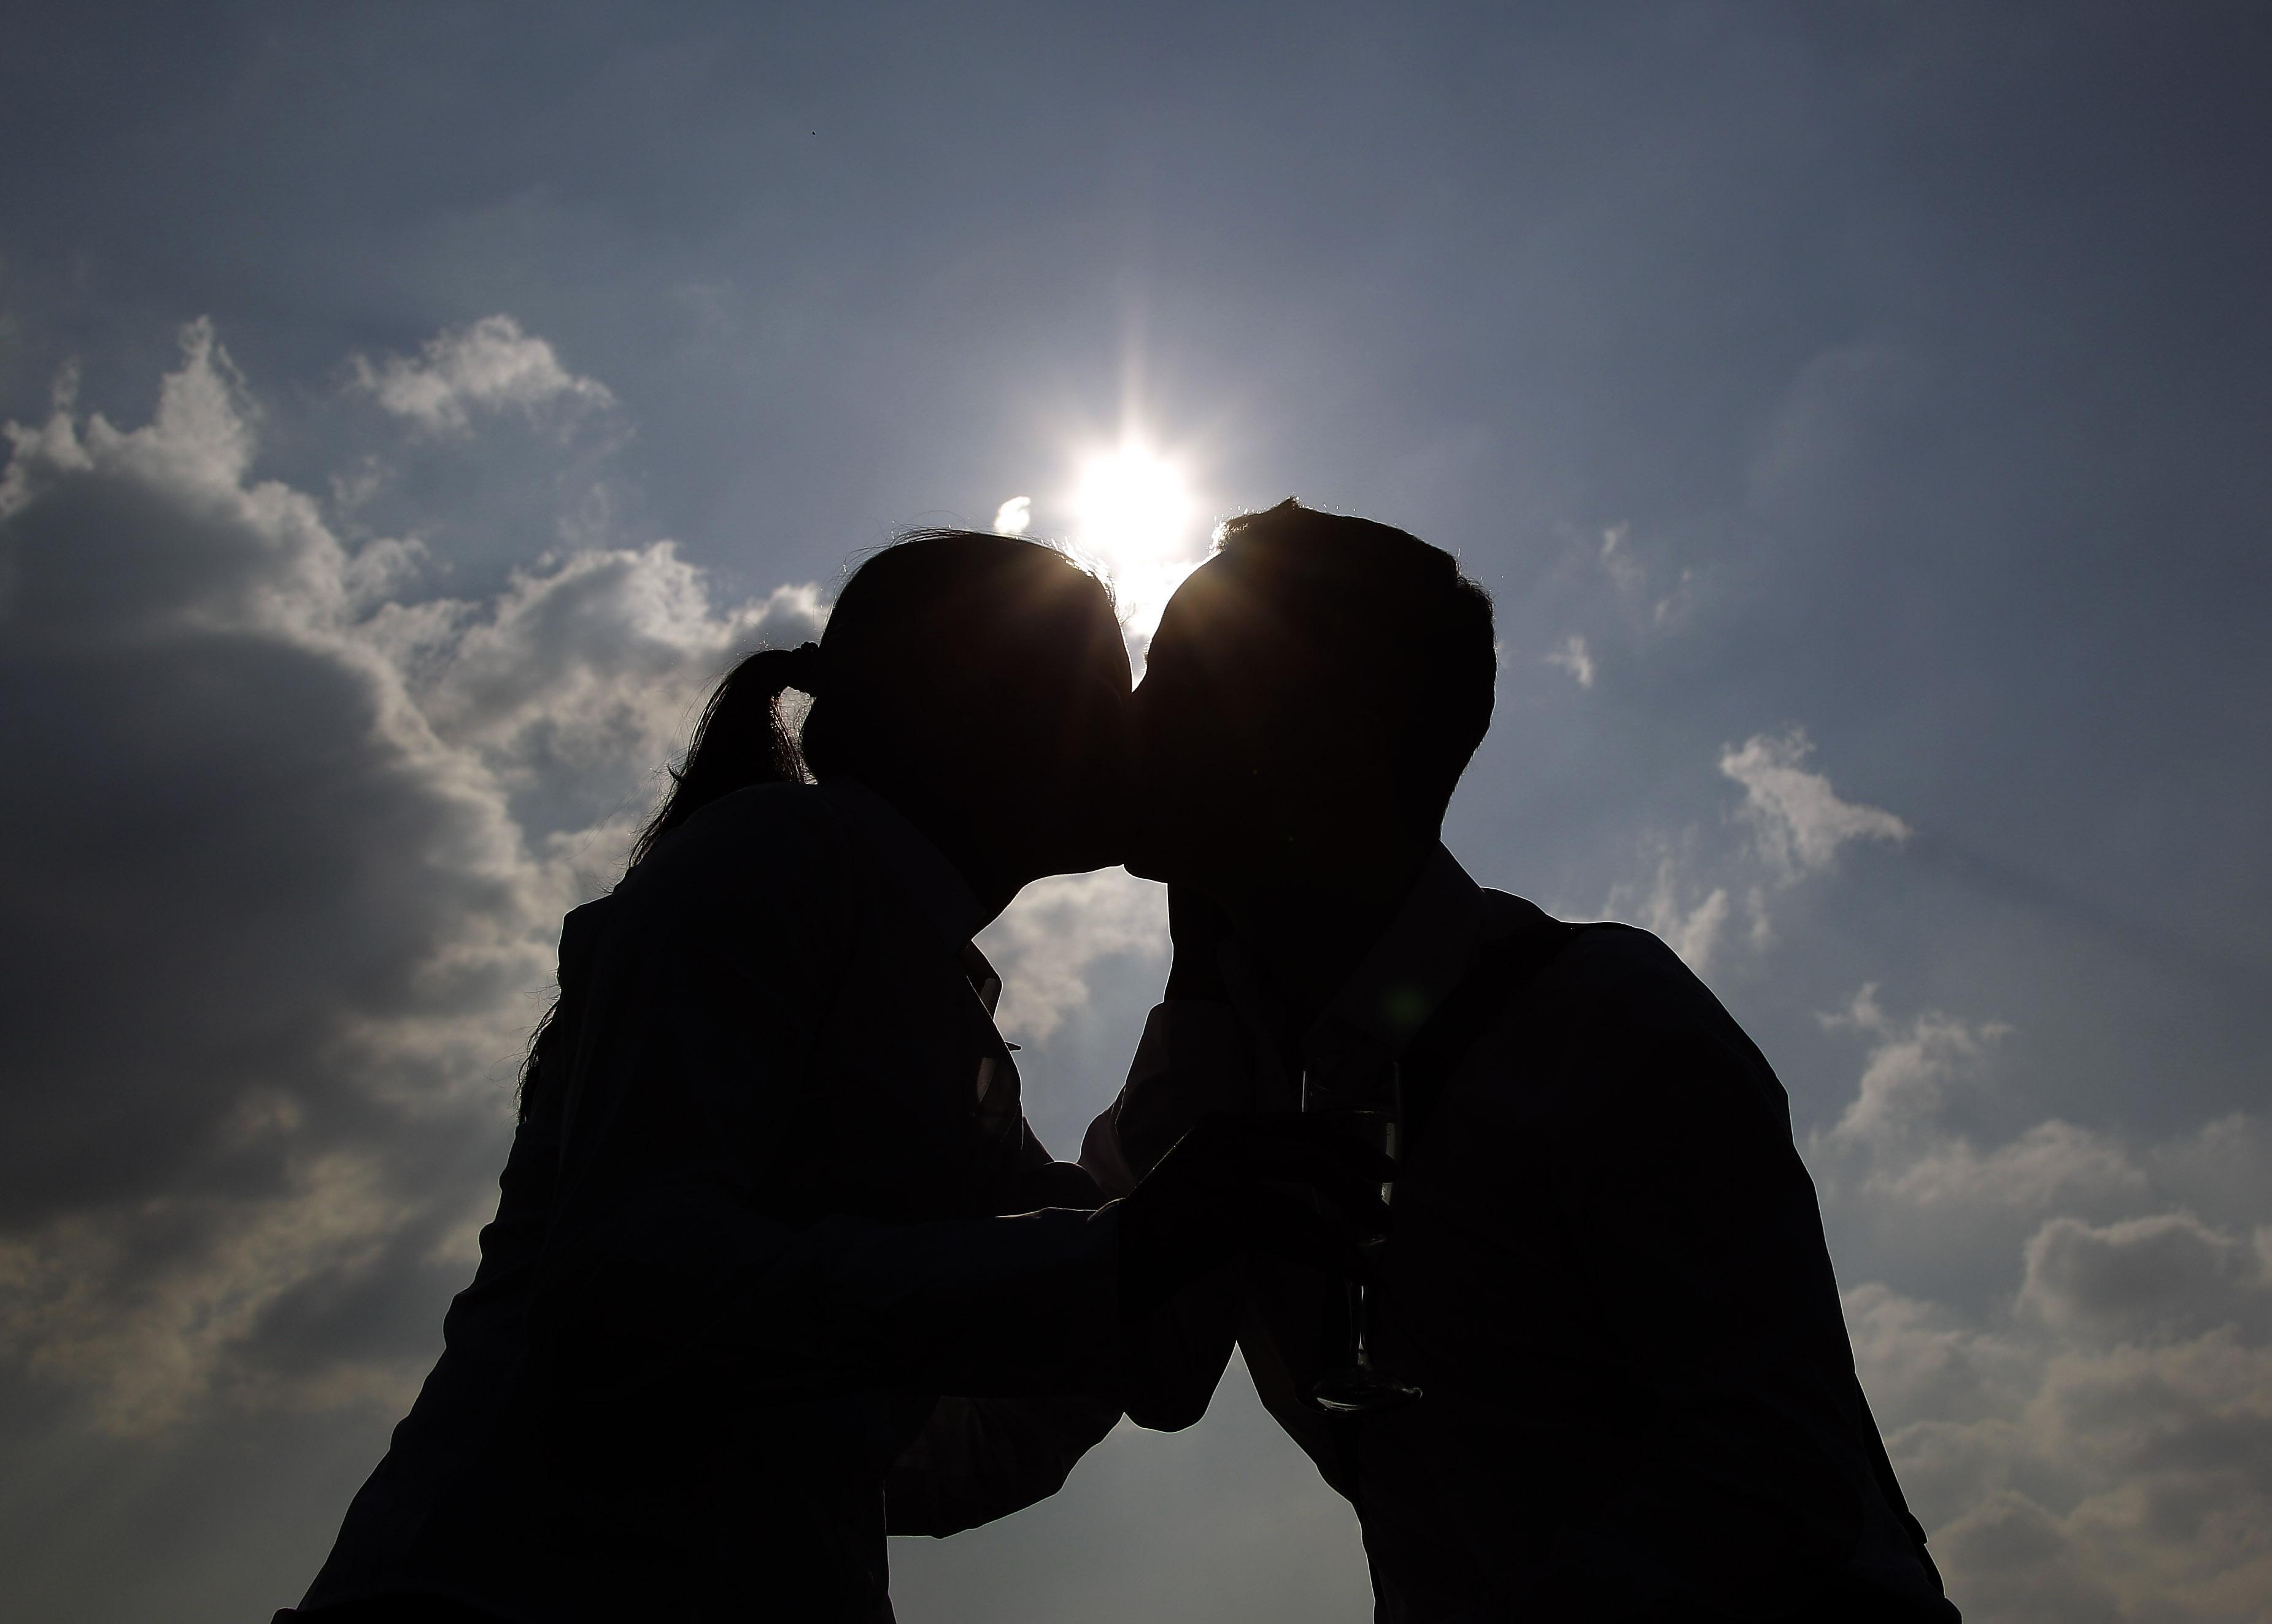 Study: Long-distance relationships might work better | Salon com